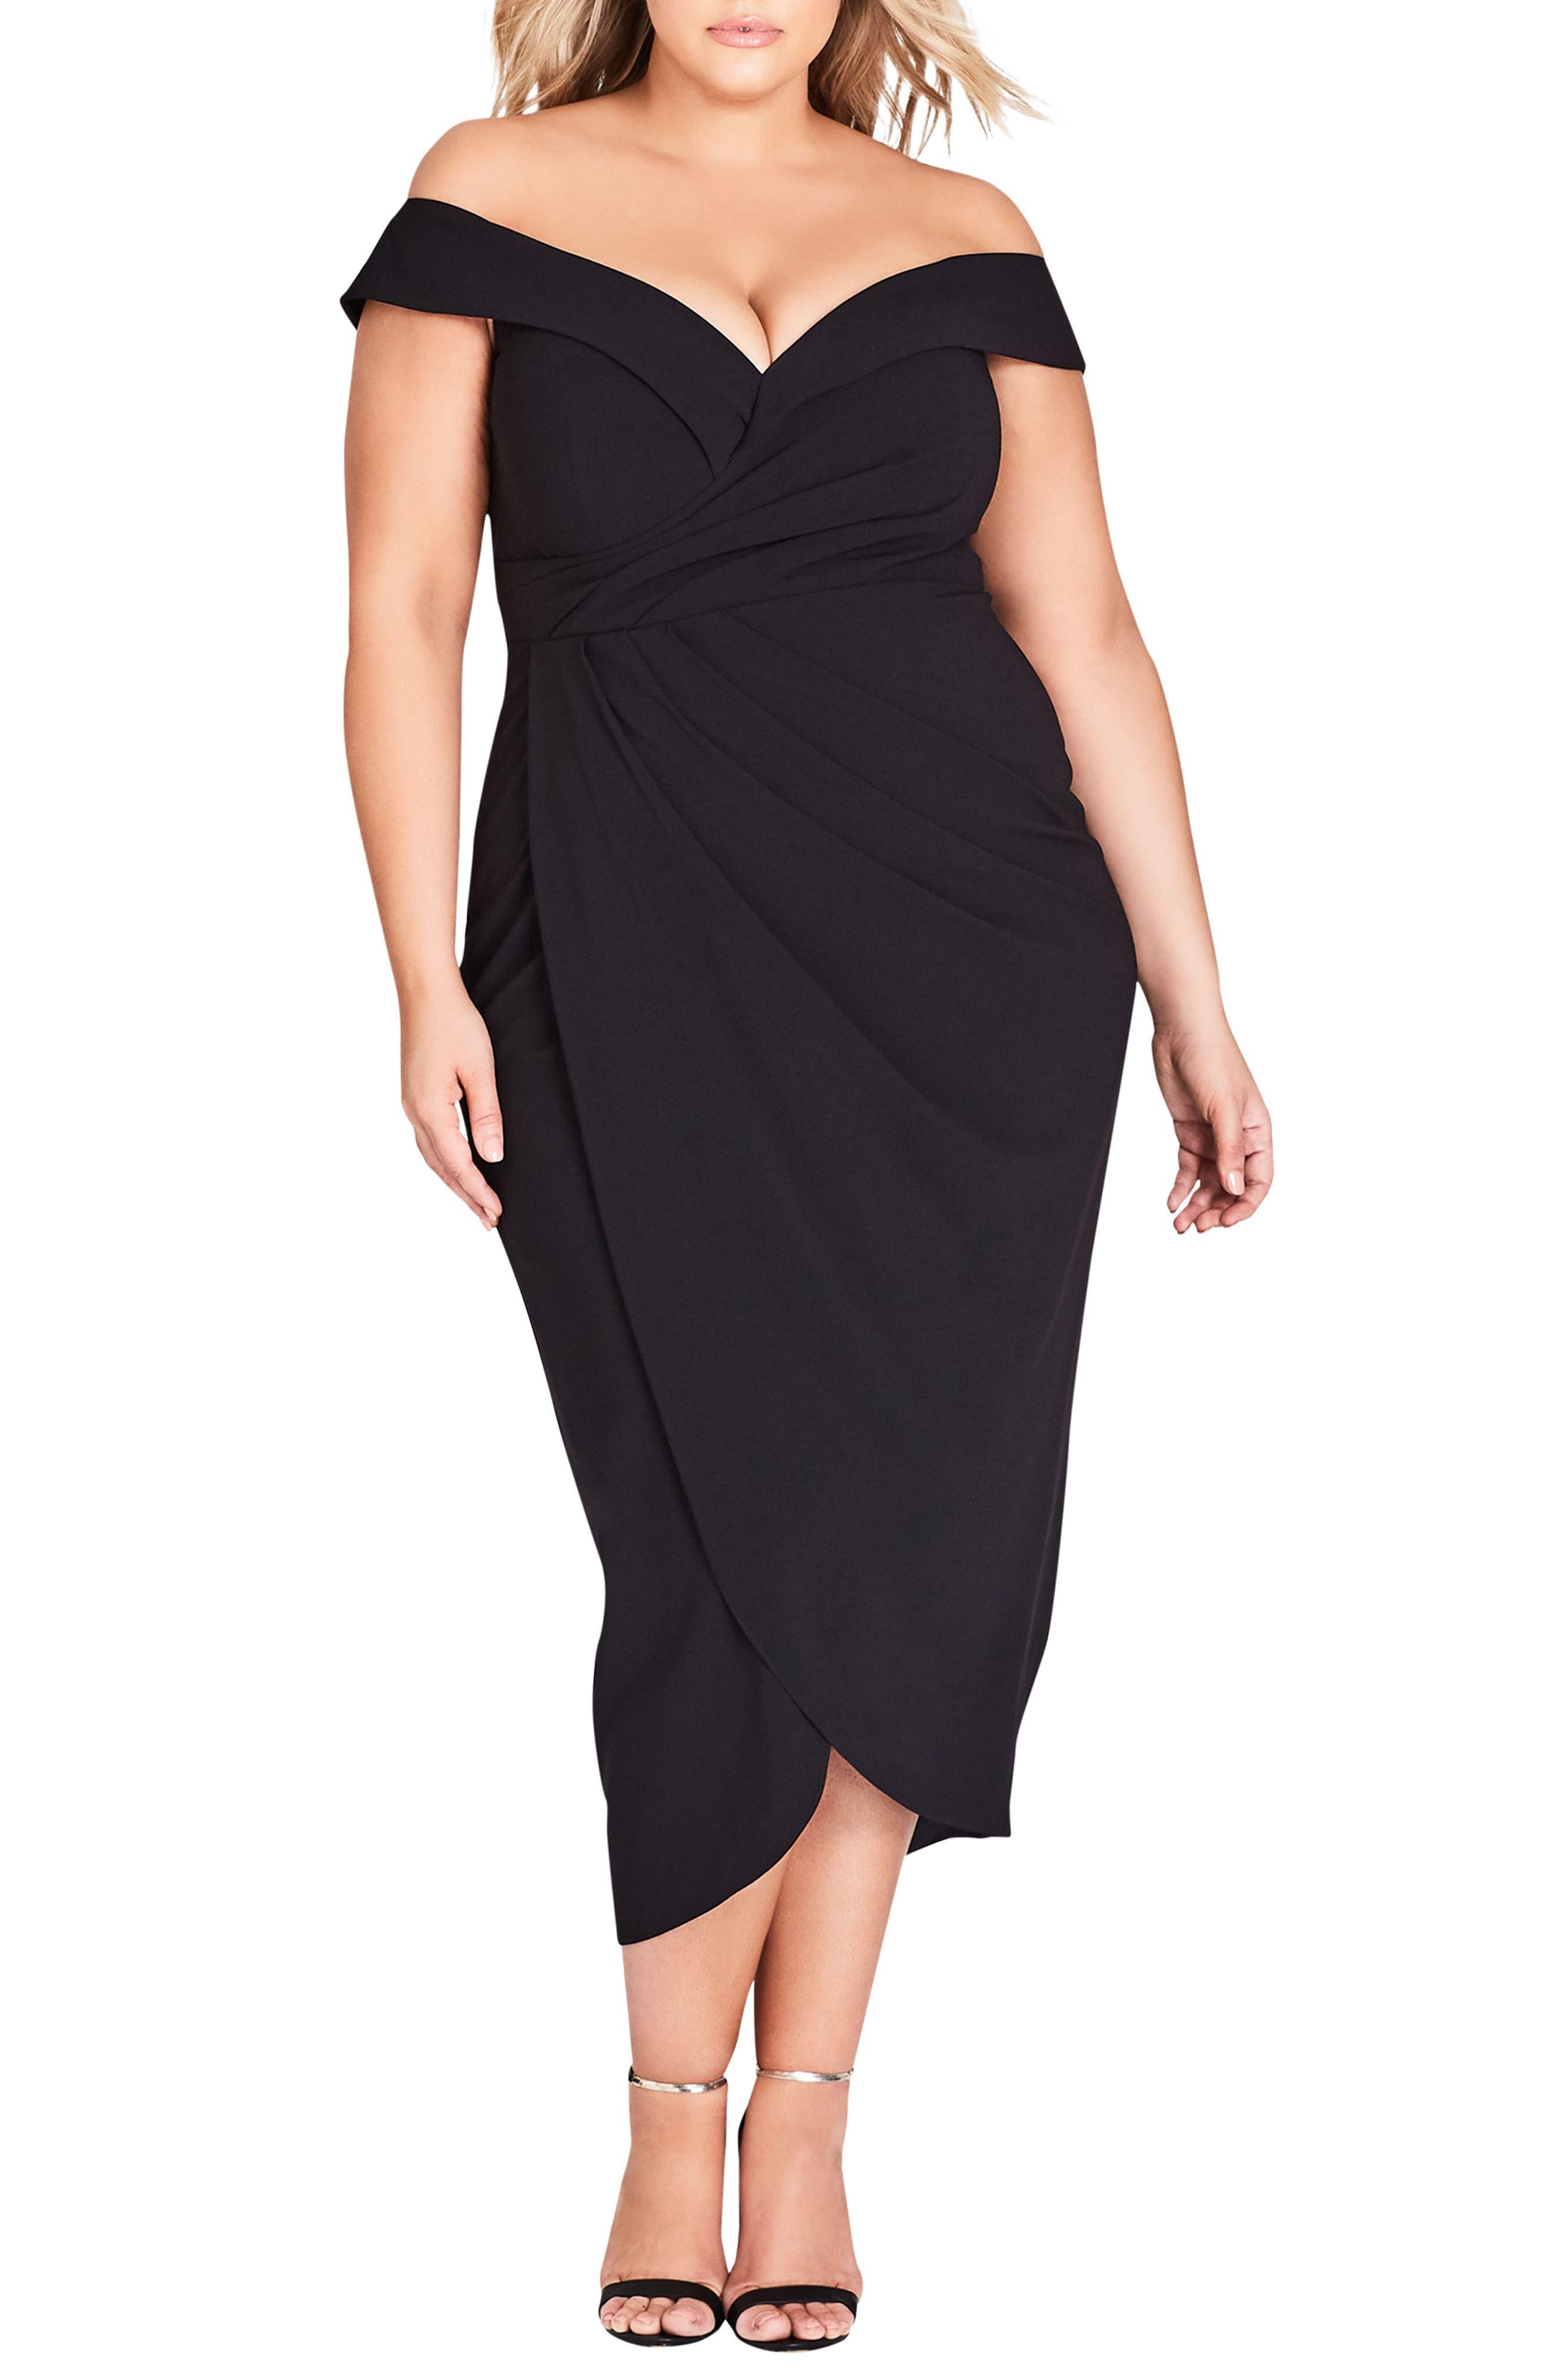 Plus Size City Chic Rippled Love Off The Shoulder Sheath Dress, Black